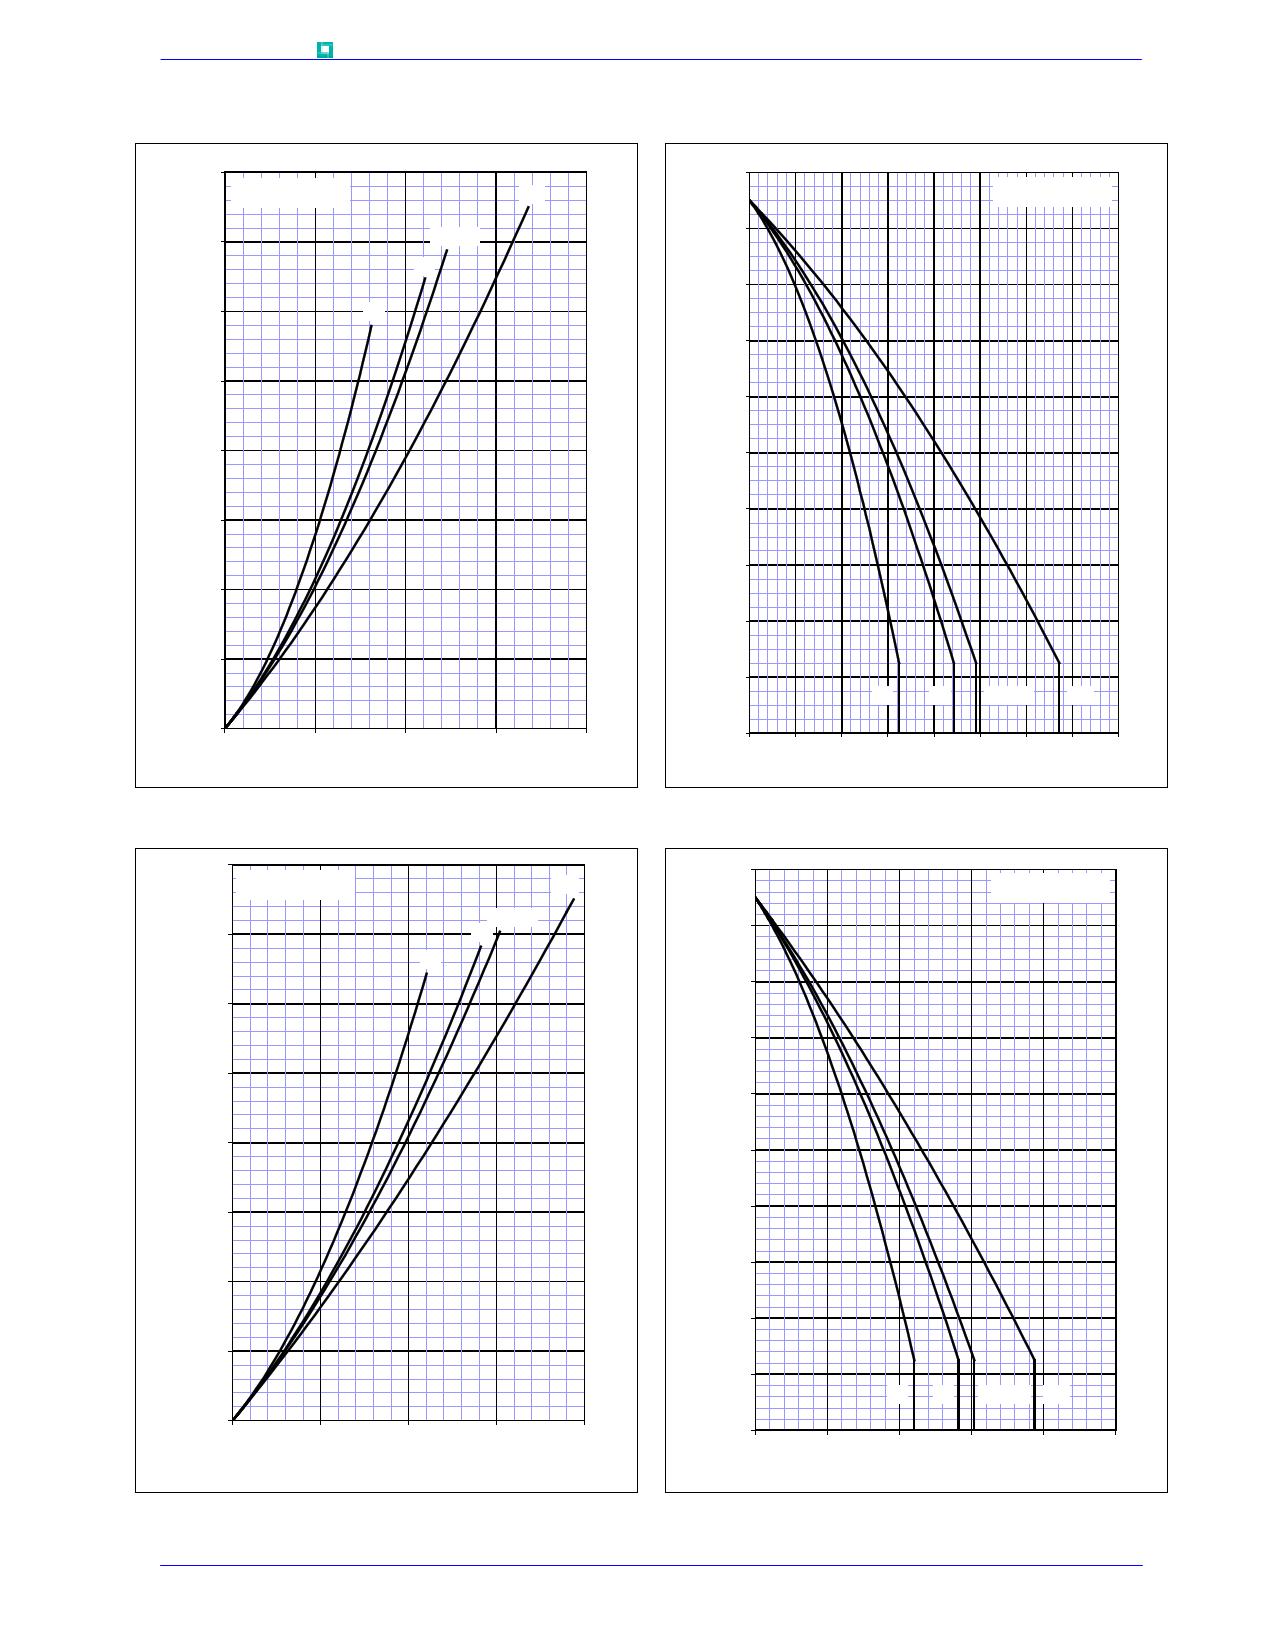 W4534ND060 pdf, equivalent, schematic